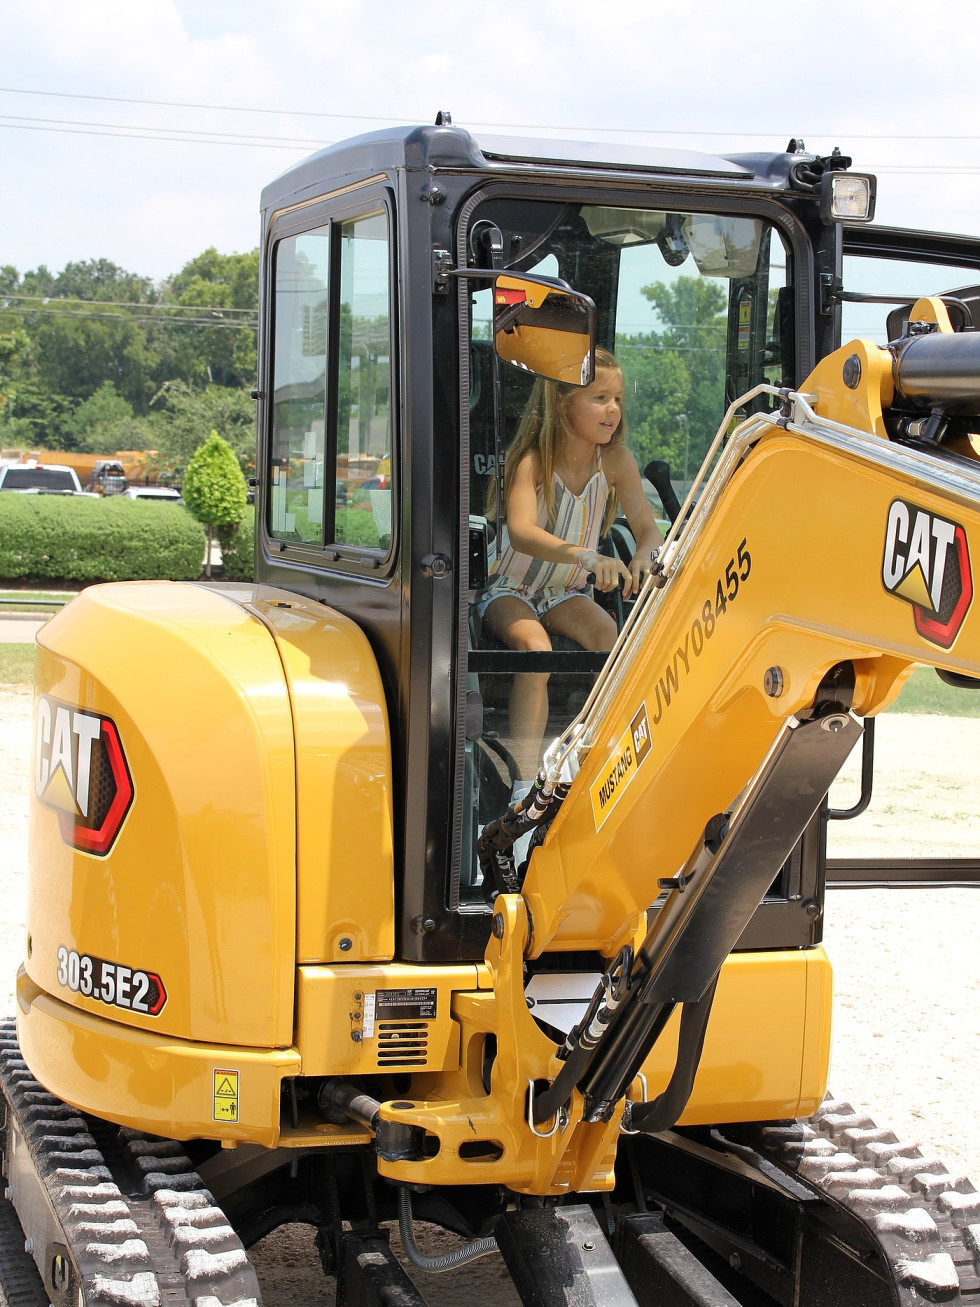 Dig World Texas Katy excavator